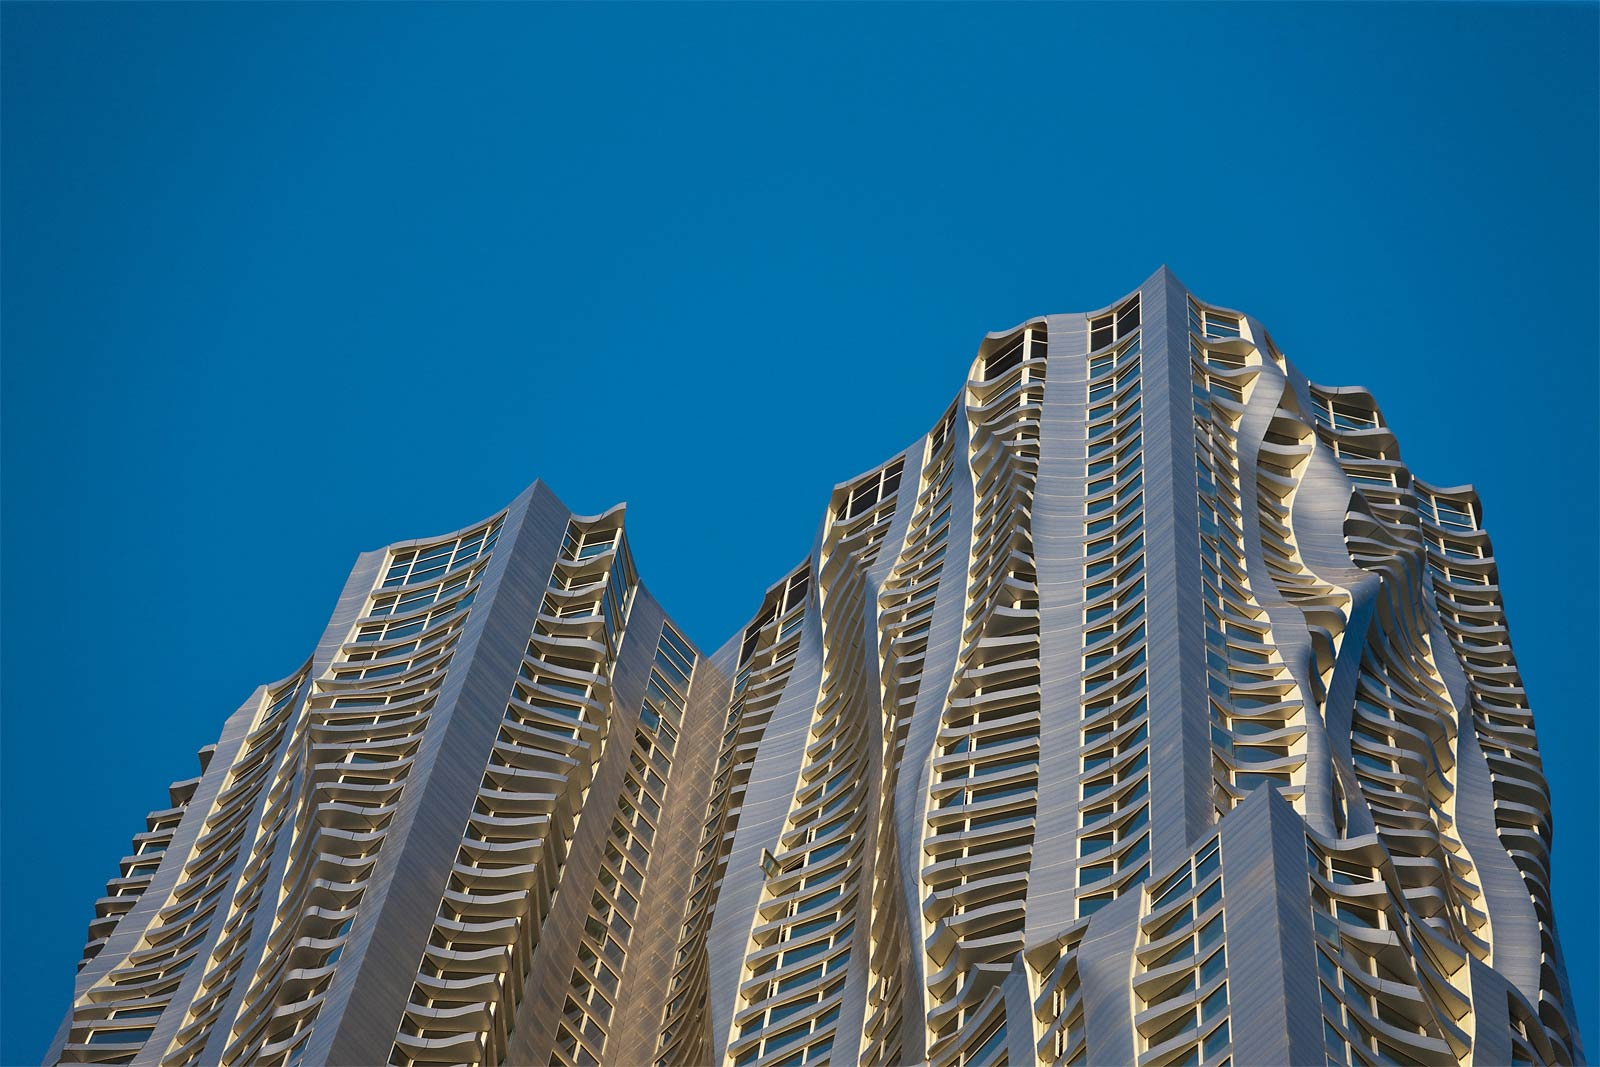 https://i2.wp.com/www.hauteresidence.com/wp-content/uploads/2013/03/Frank_Gehry_New_York.jpeg